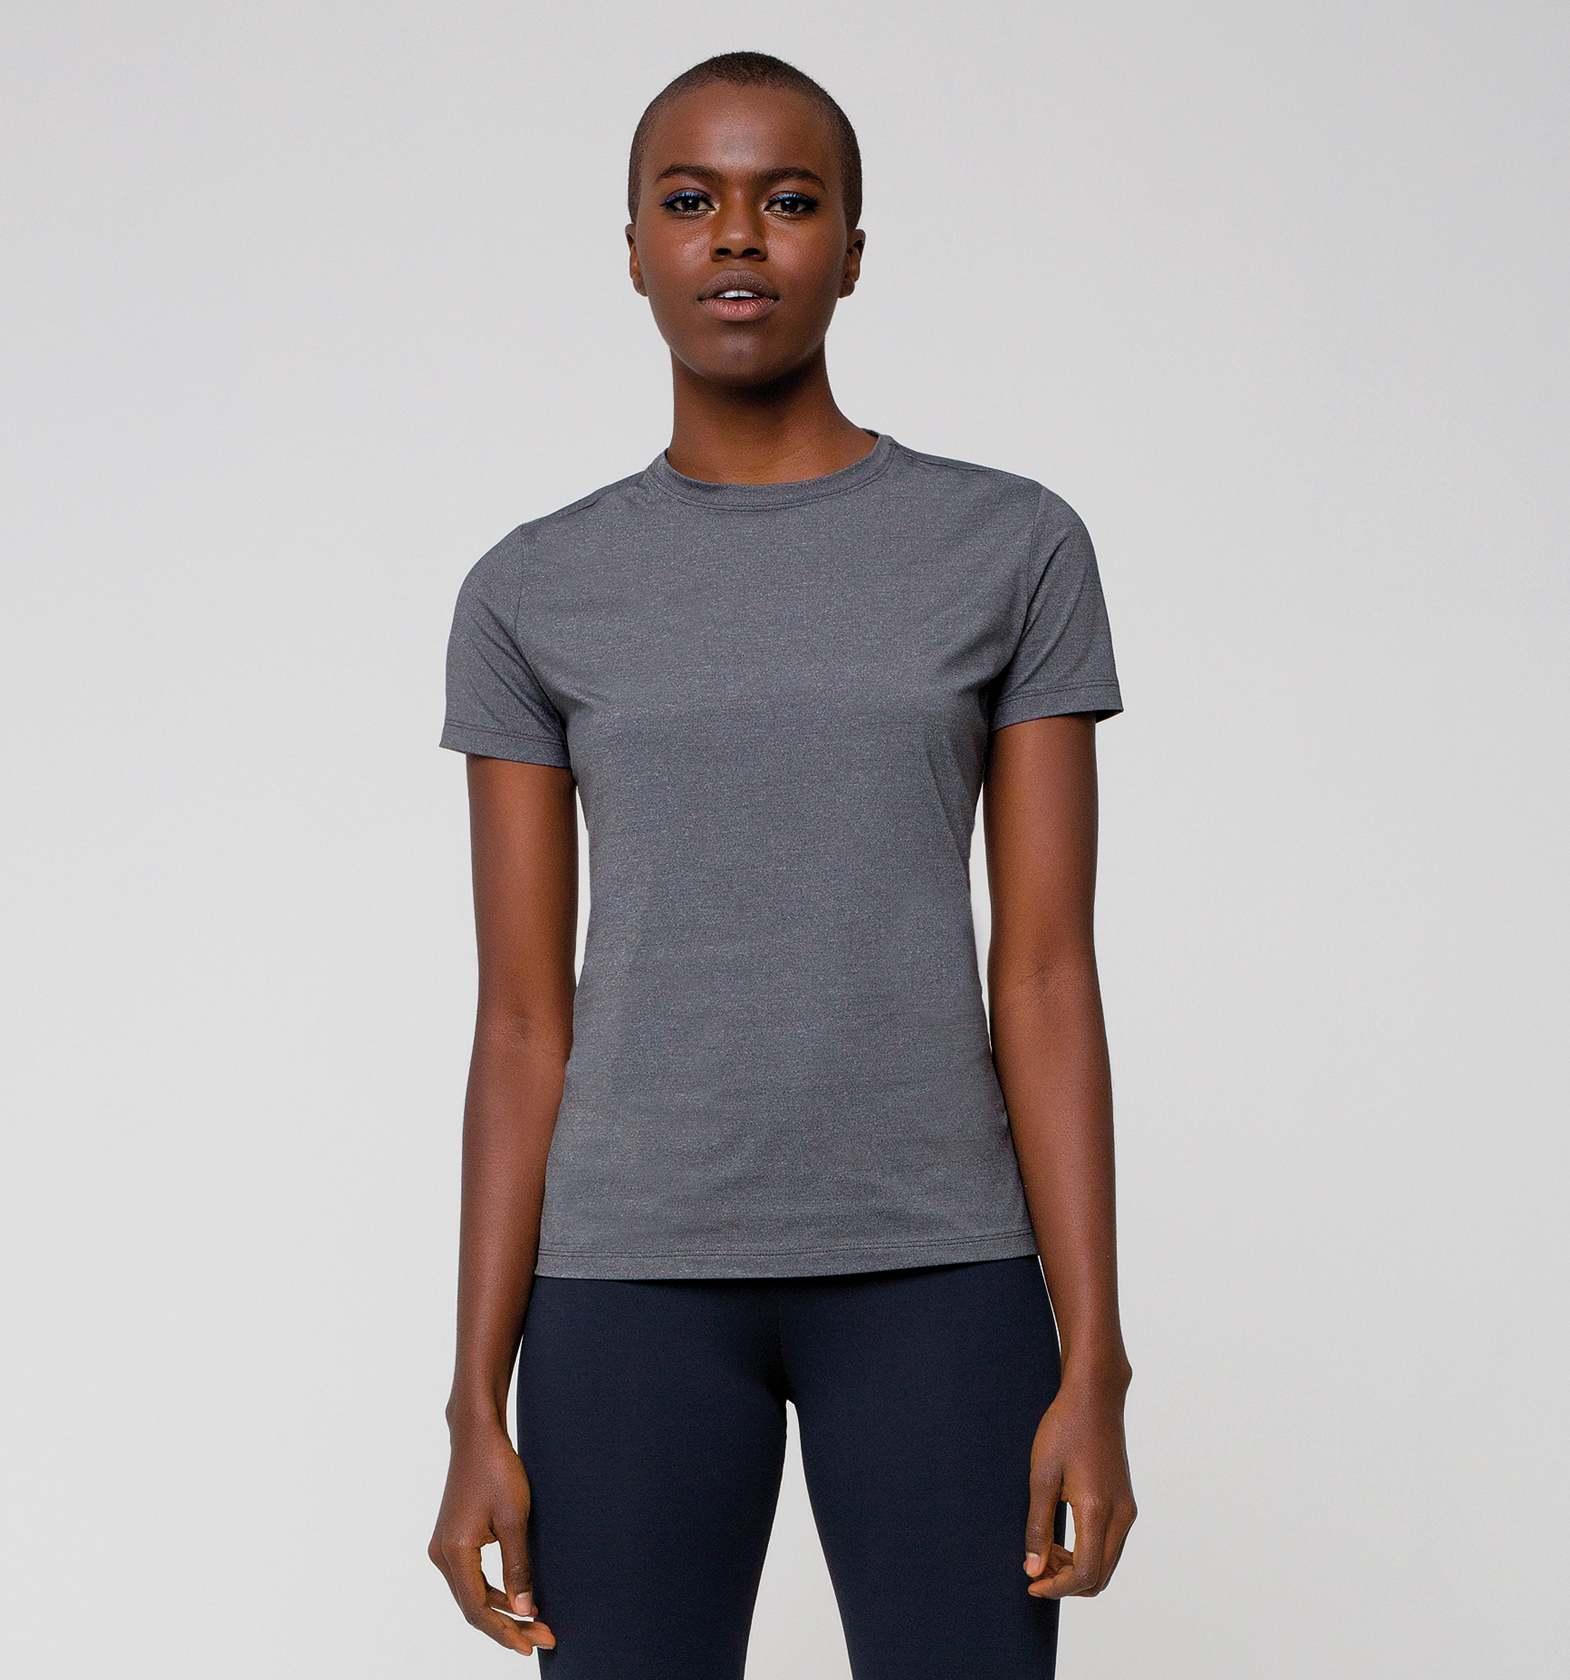 UV LINE Camiseta Uvpro Manga Curta Feminino Mescla Proteção Solar